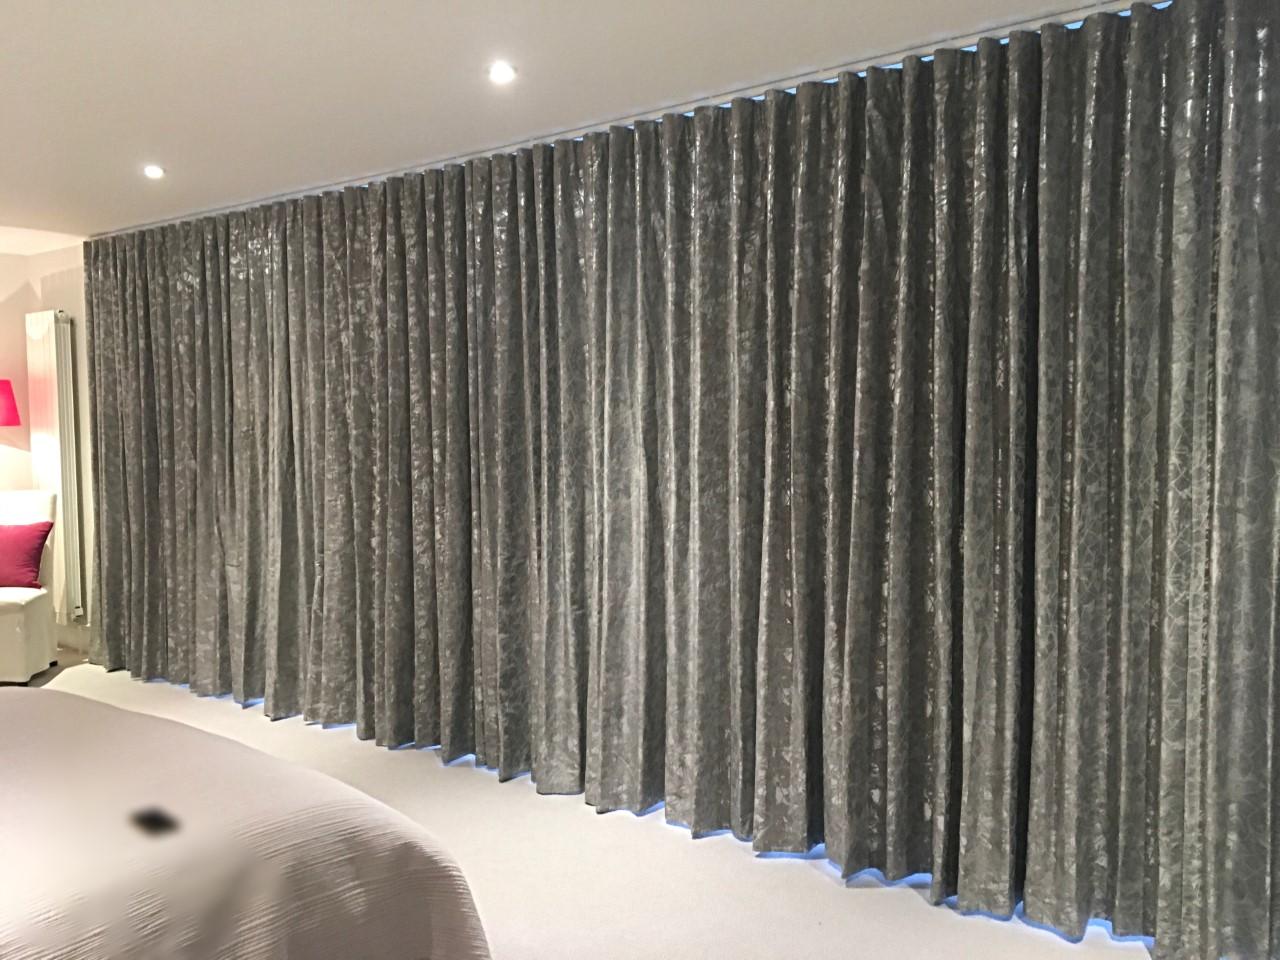 Floor to Ceiling Wave Headed Curtains, Villa Nova Xander Collection